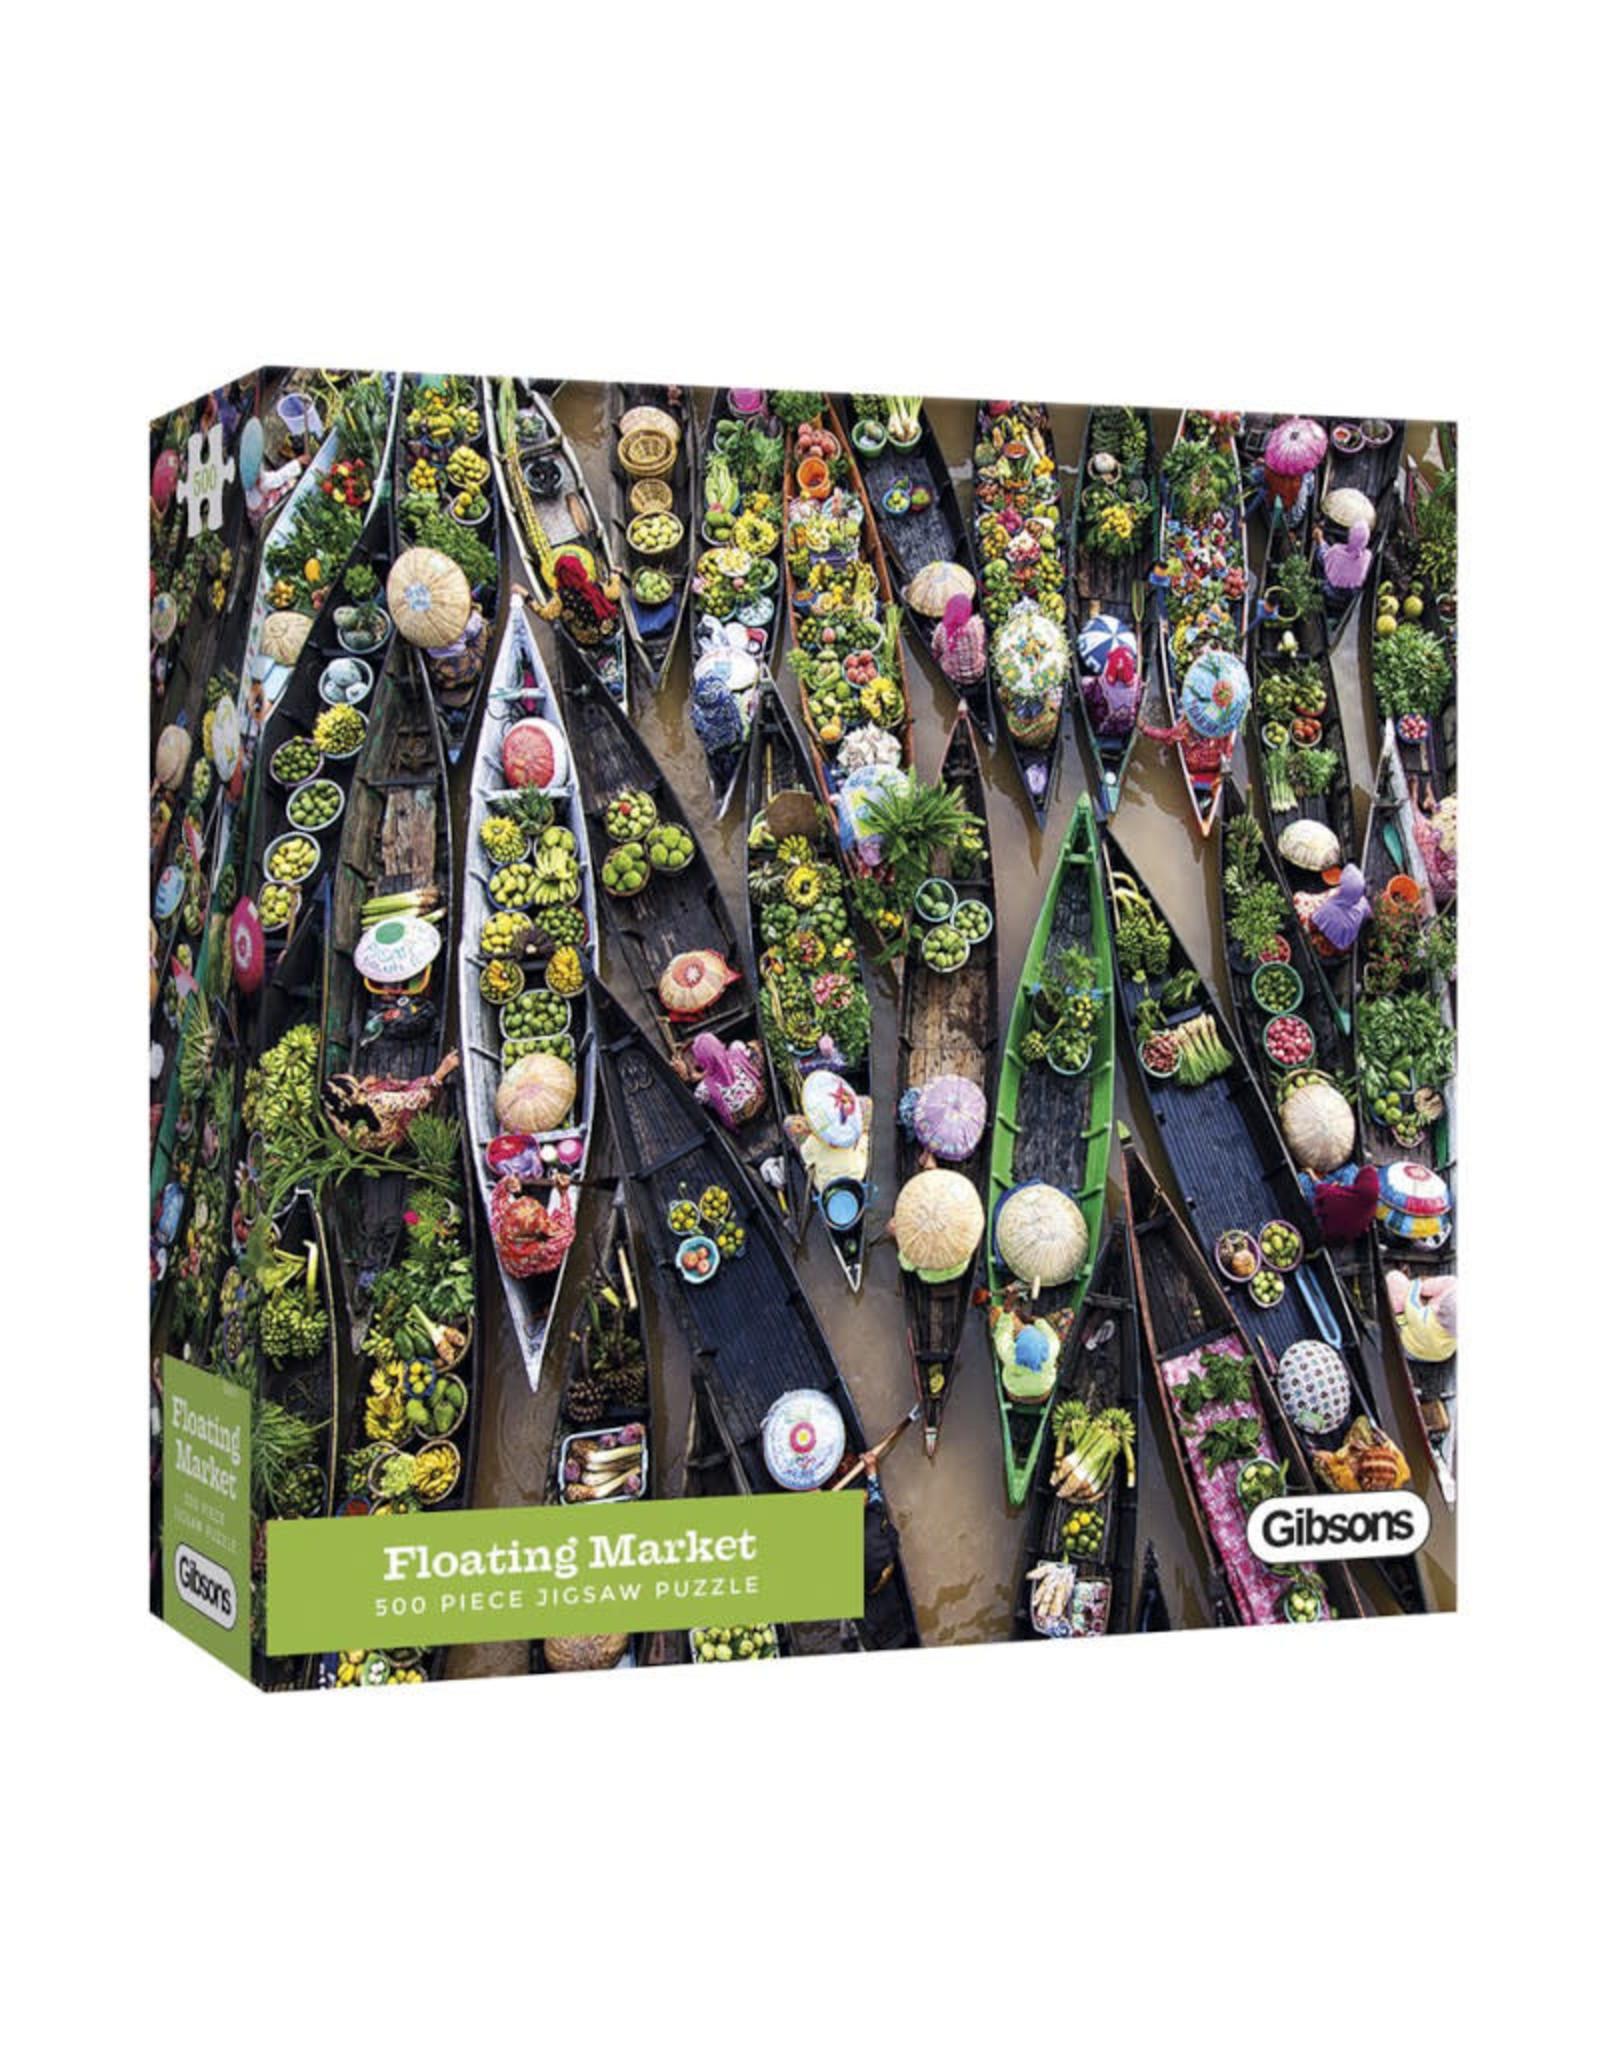 Gibsons Floating Market Puzzle 500 PCS